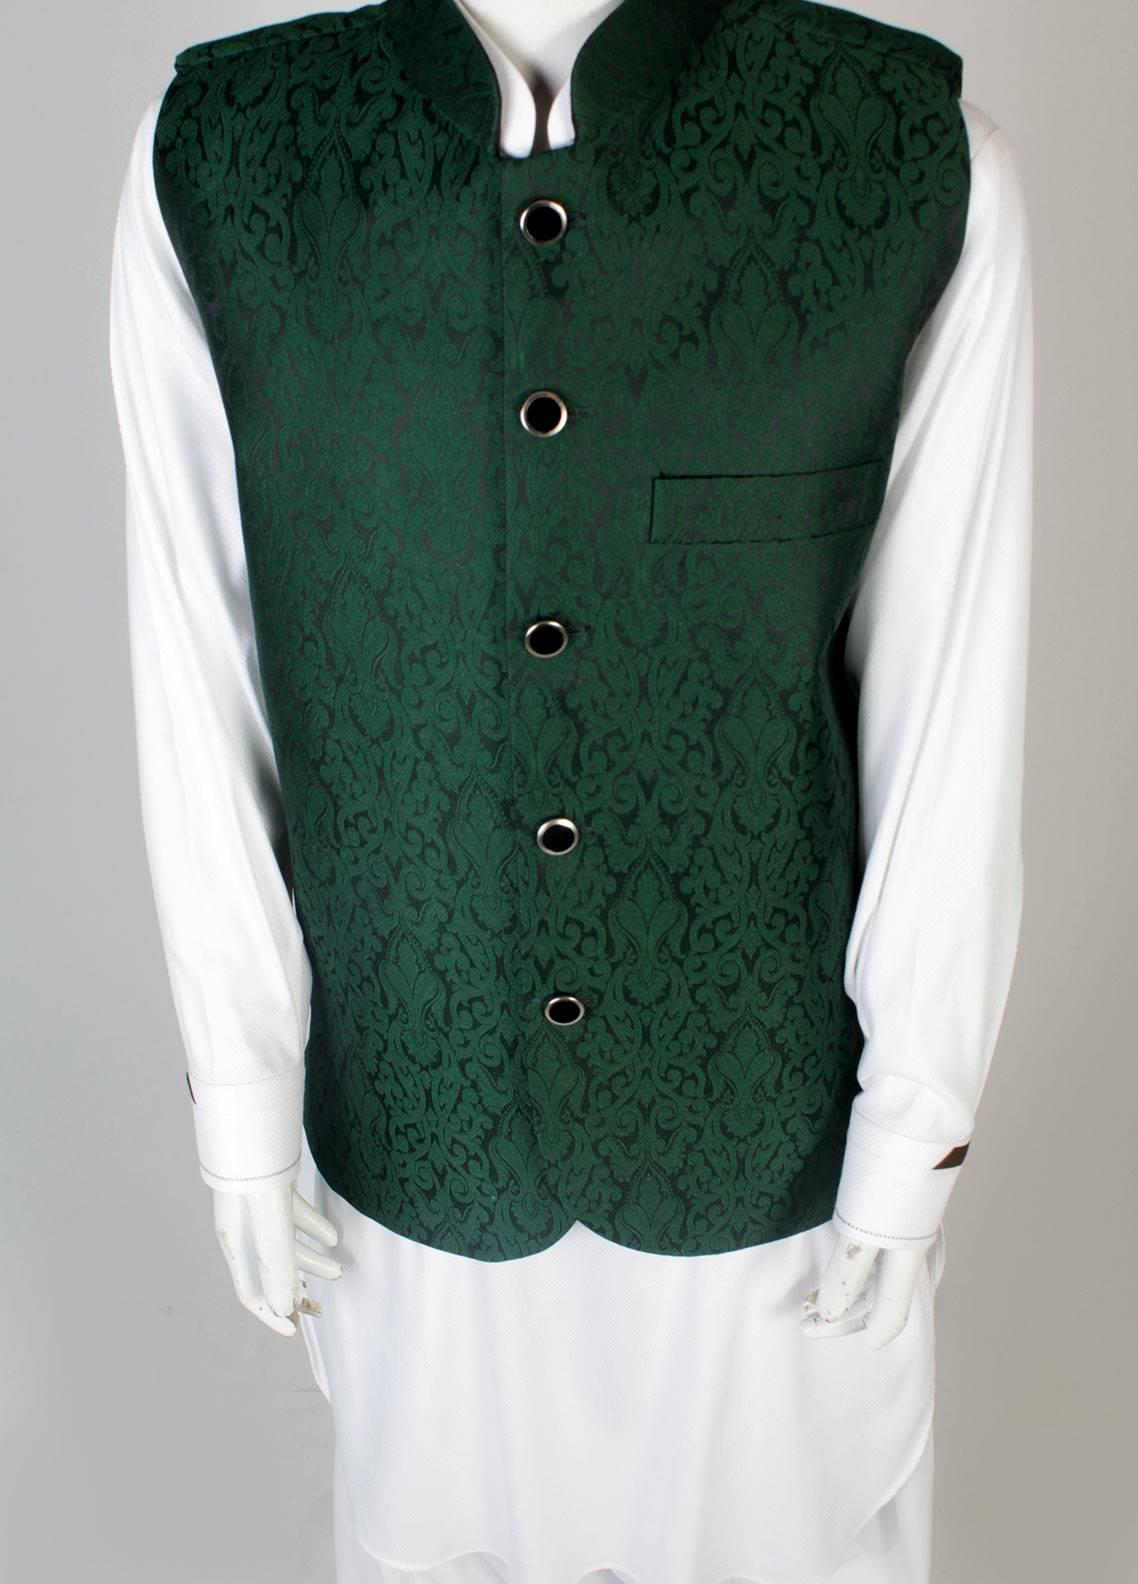 Sanaulla Exclusive Range Banarsi Fancy Waistcoat for Boys - Green SA18W 001